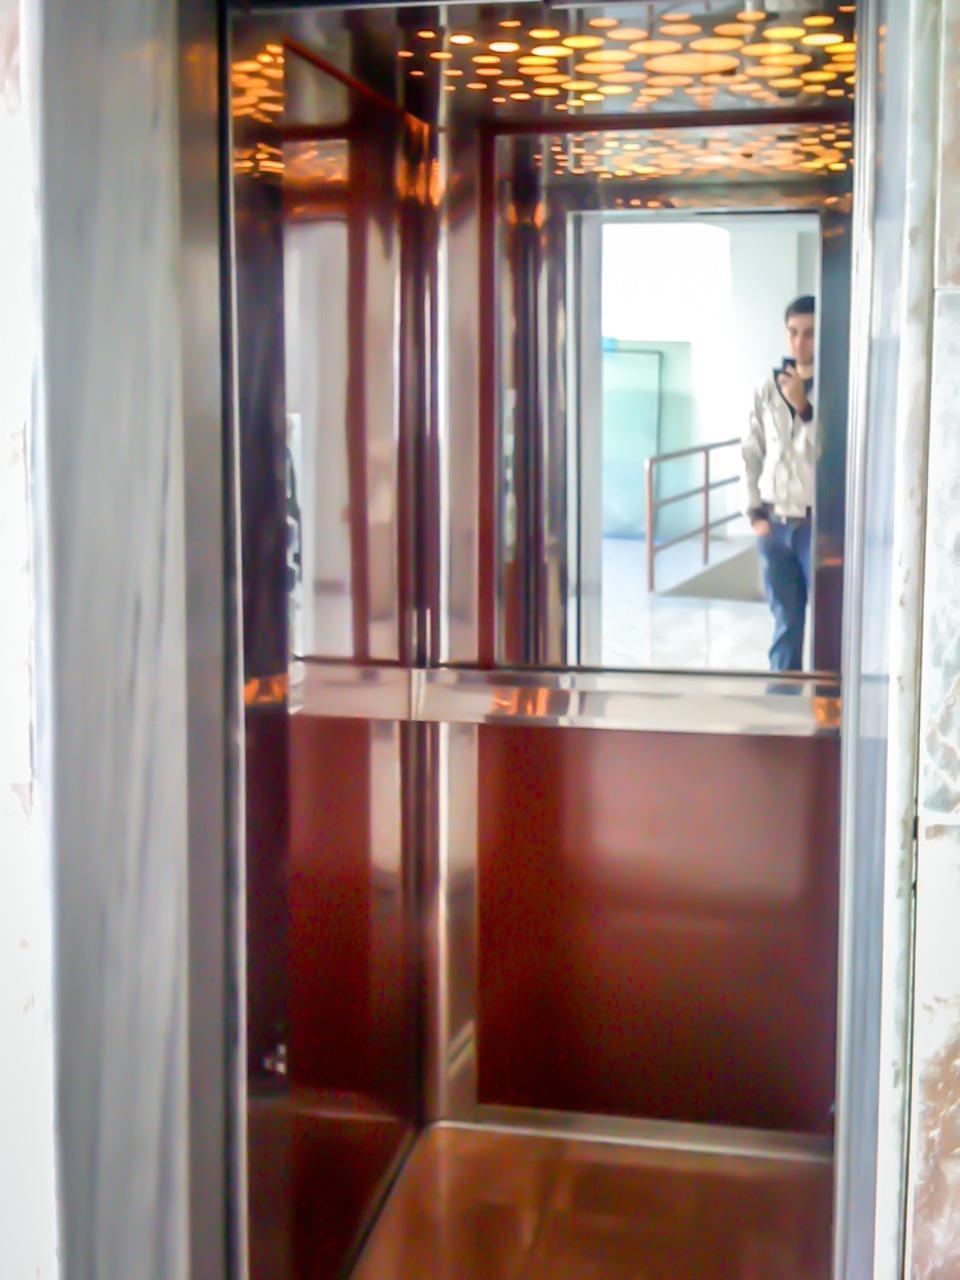 zlift-erga-lifts-7 Εγκατάσταση Ανελκυστήρα - Ρόδος